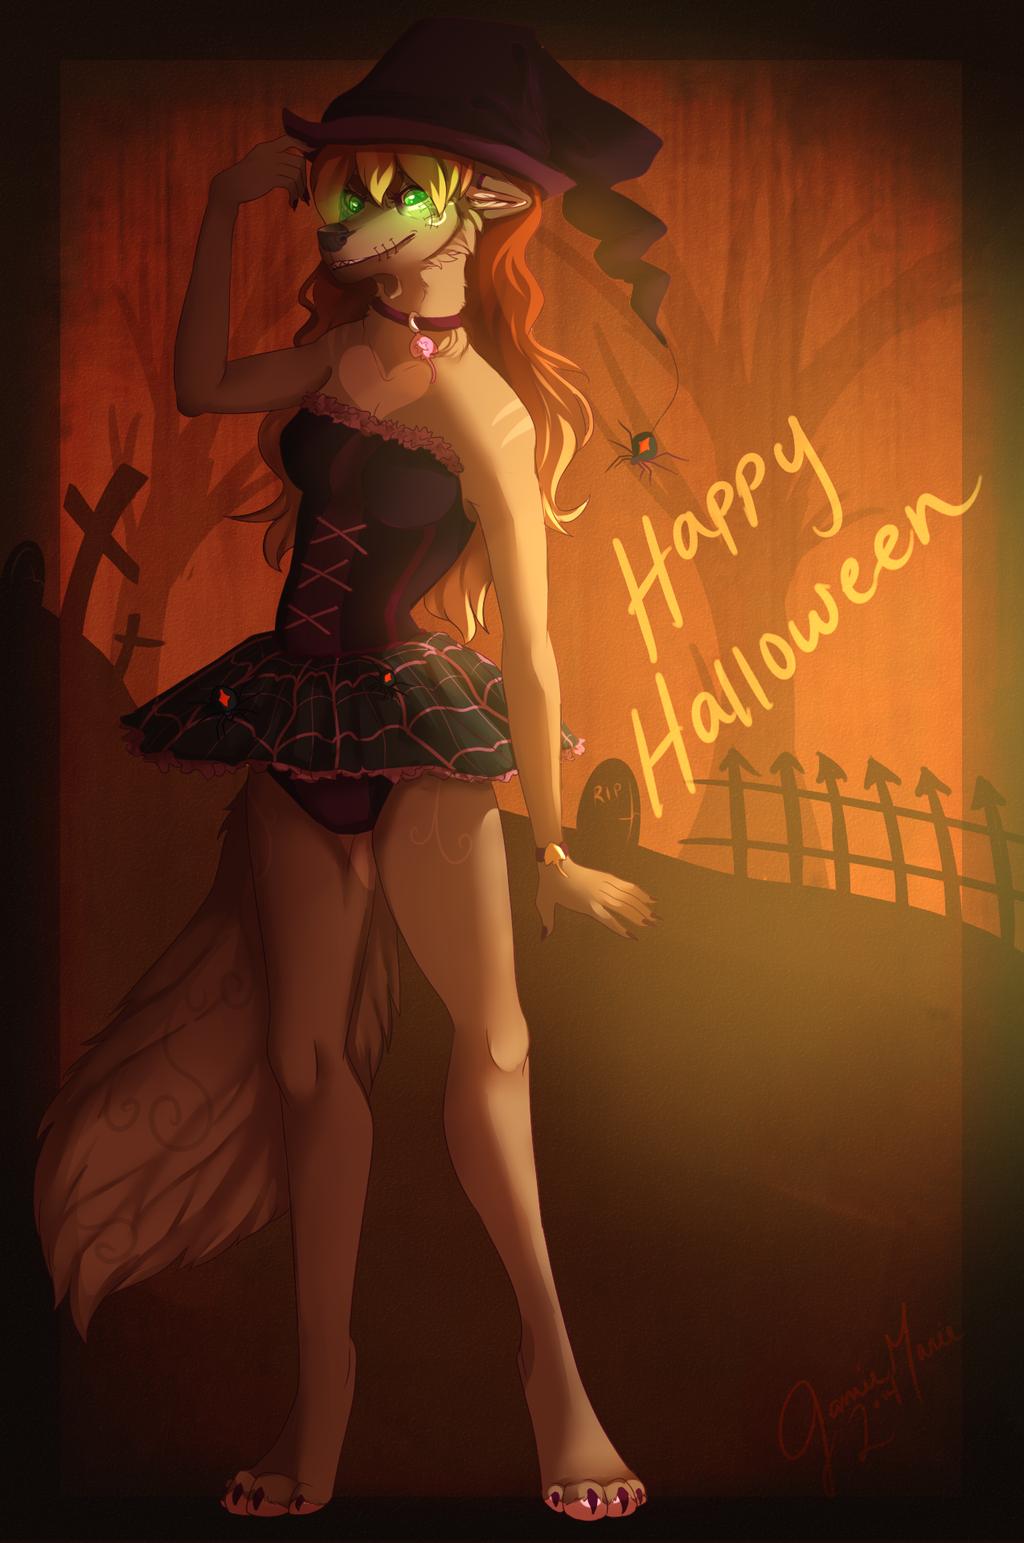 A Fluffy Halloween by LittleRavine